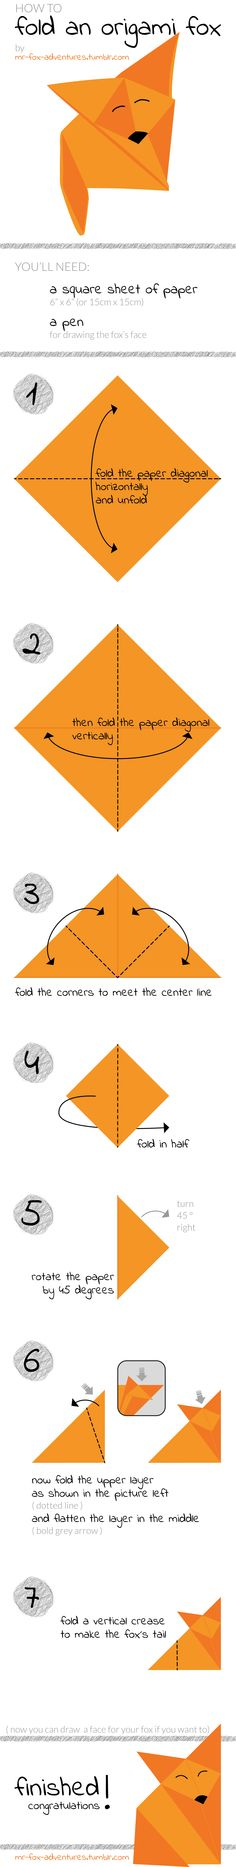 Origami Fox Tutorial for my blog http://mr-fox-adventures.tumblr.com/ #diy #origami #fox